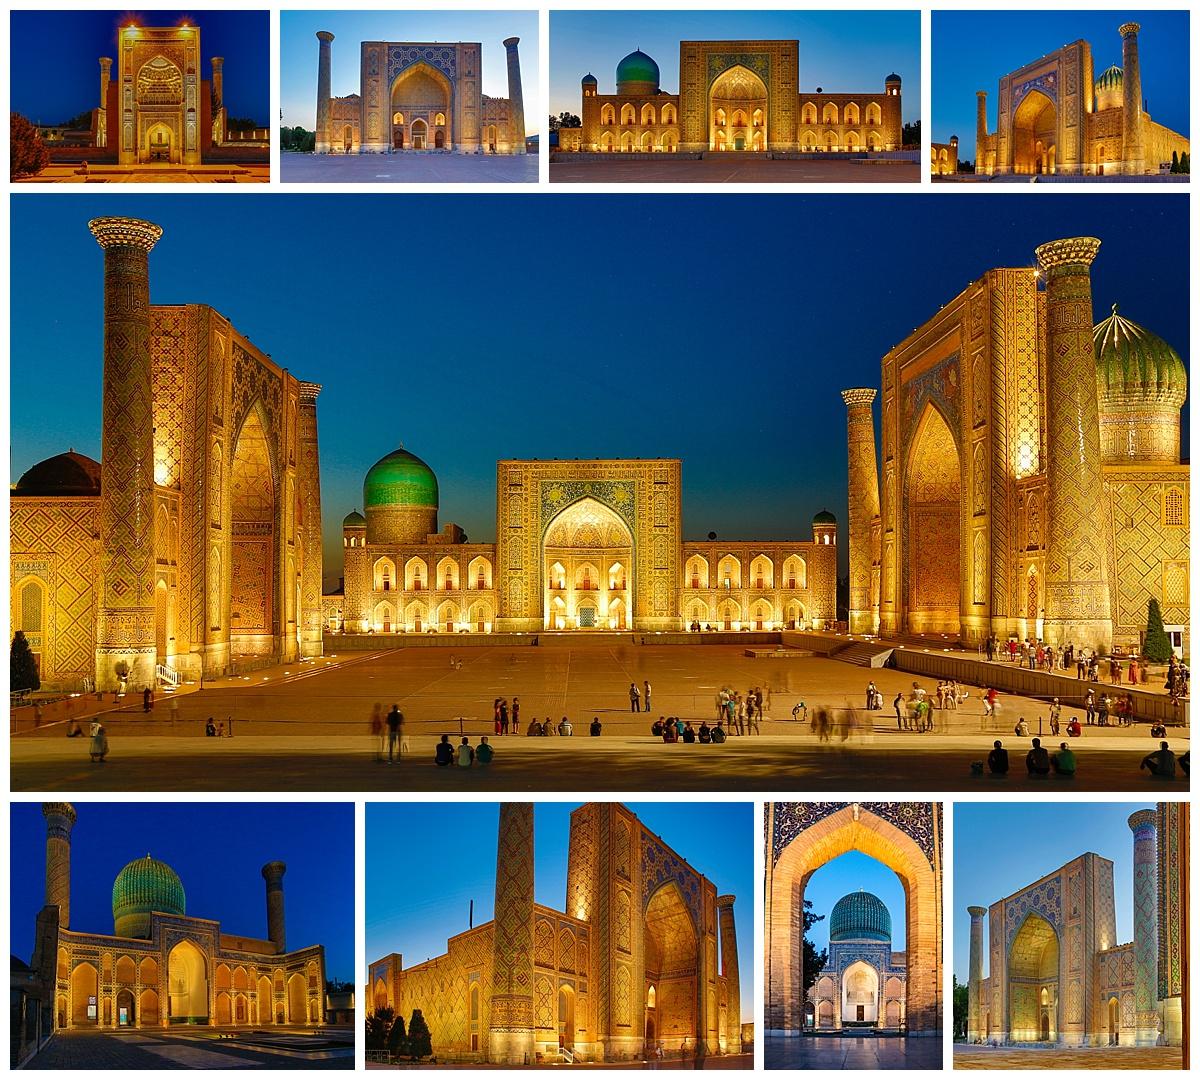 Samarkand, Uzbekistan - lit temples at night